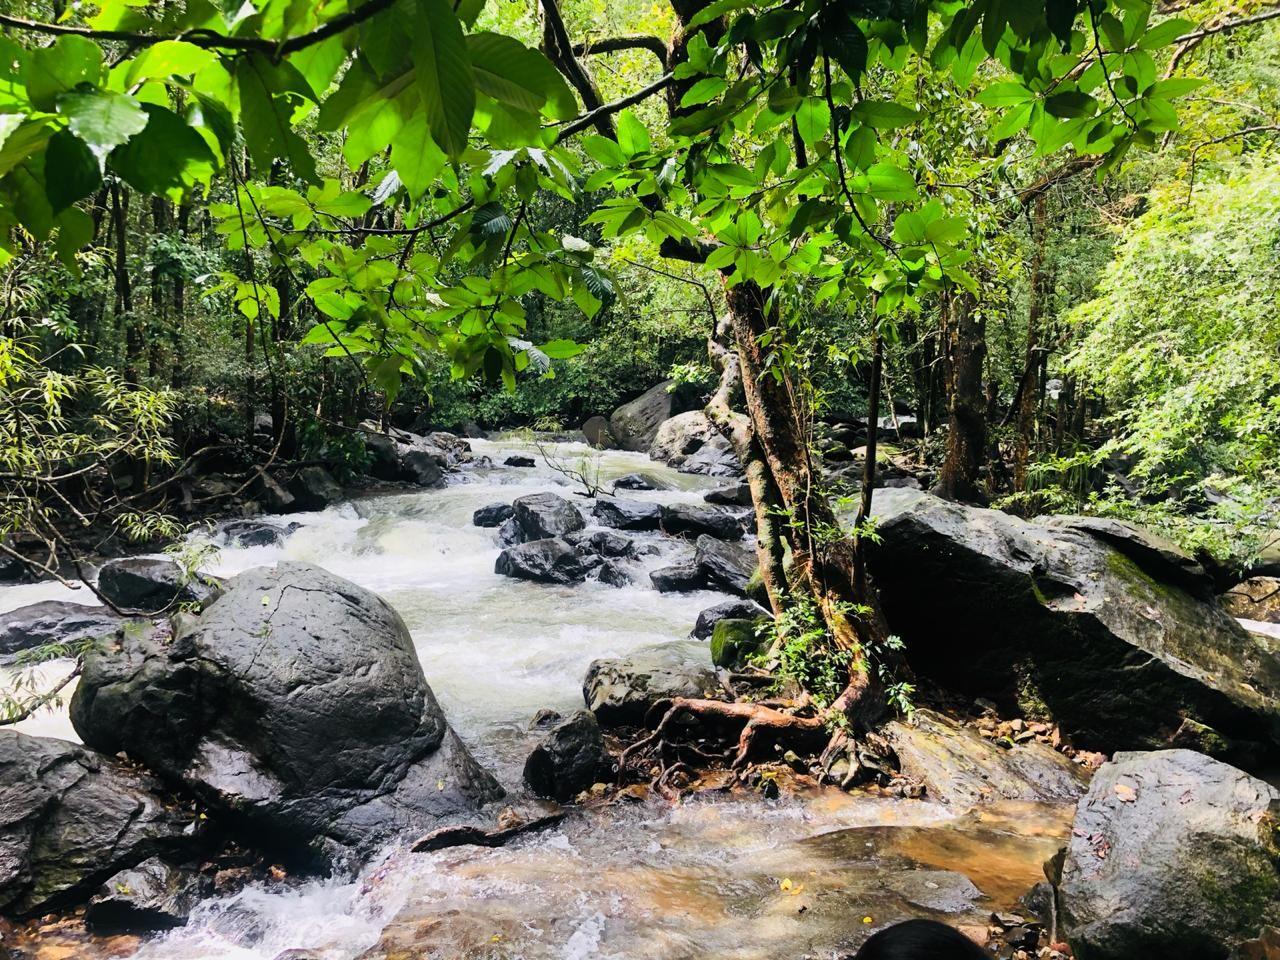 Photo of Dudhsagar Falls By Ankit Kumar